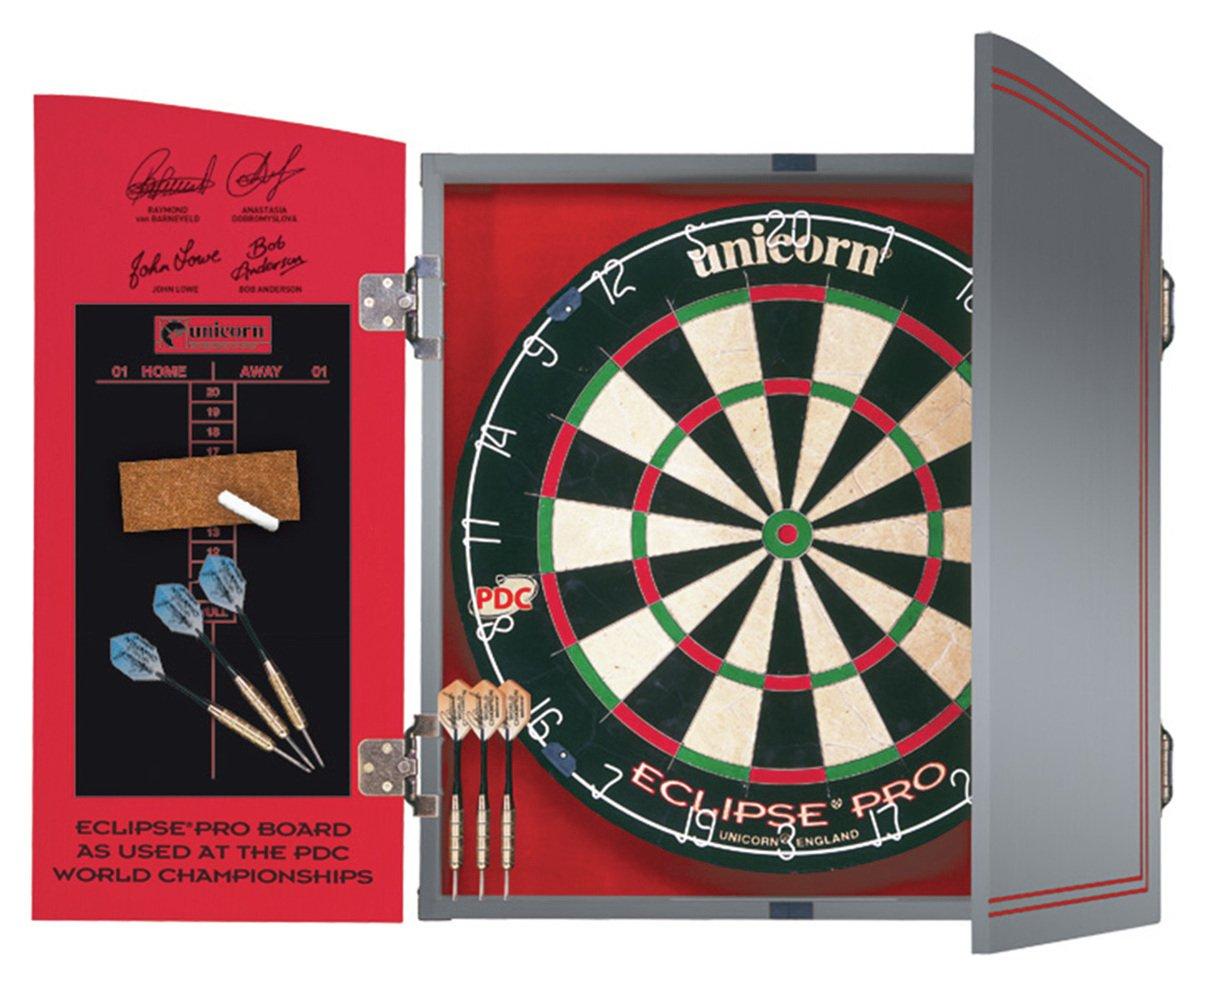 Unicorn World Championship Dartboard, Cabinet & 2 Darts Sets £39.99 free click and collect at Argos